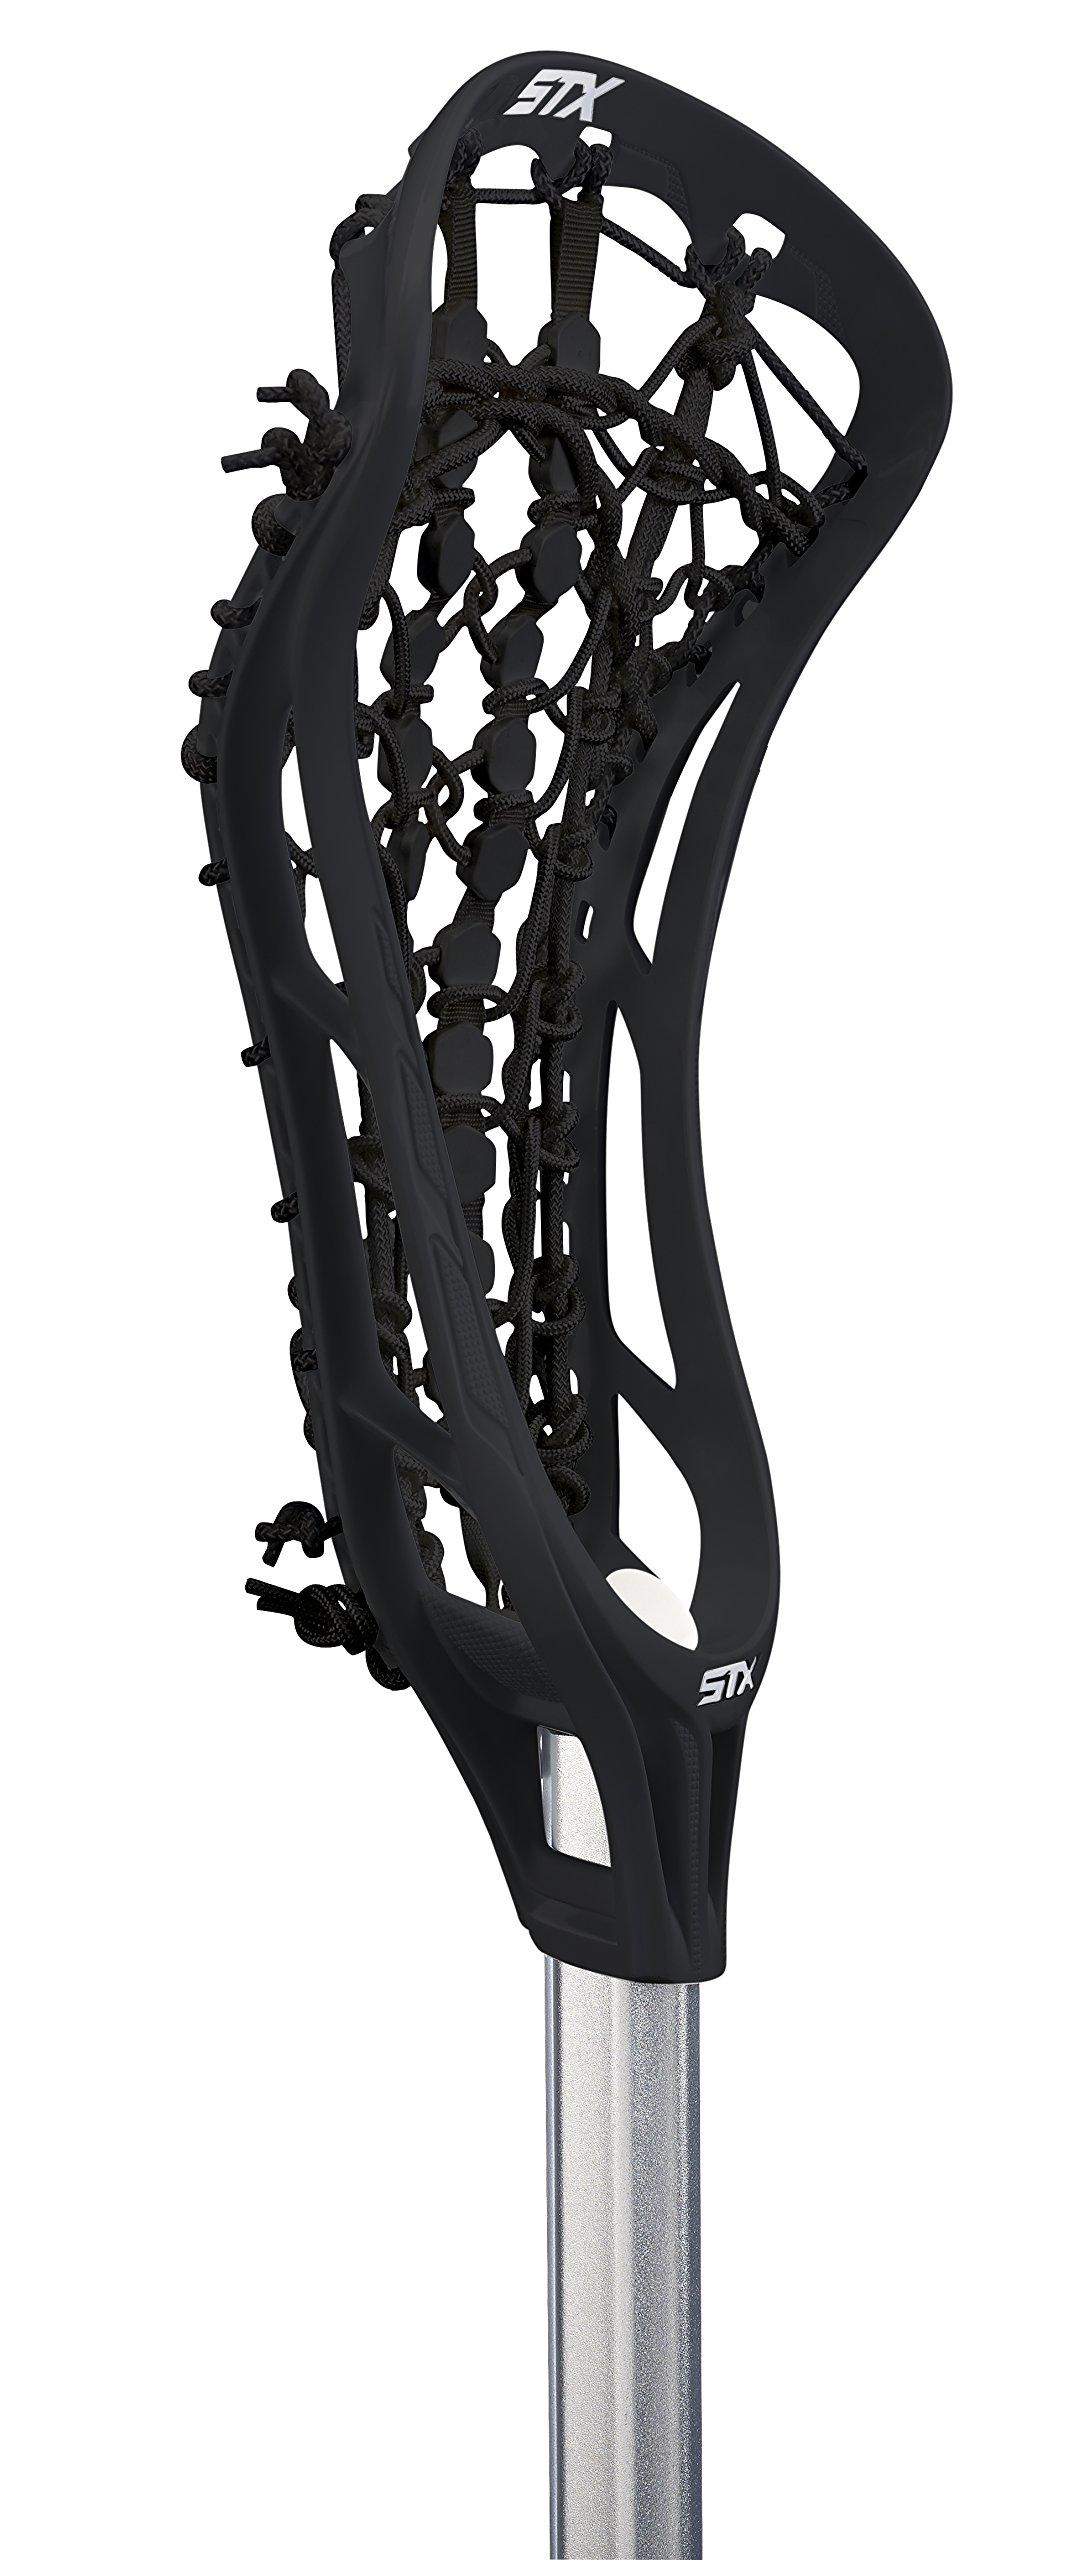 STX Lacrosse Women's EXULT 300 Complete Stick Black Head and Runway Pocket on 7075 Handle